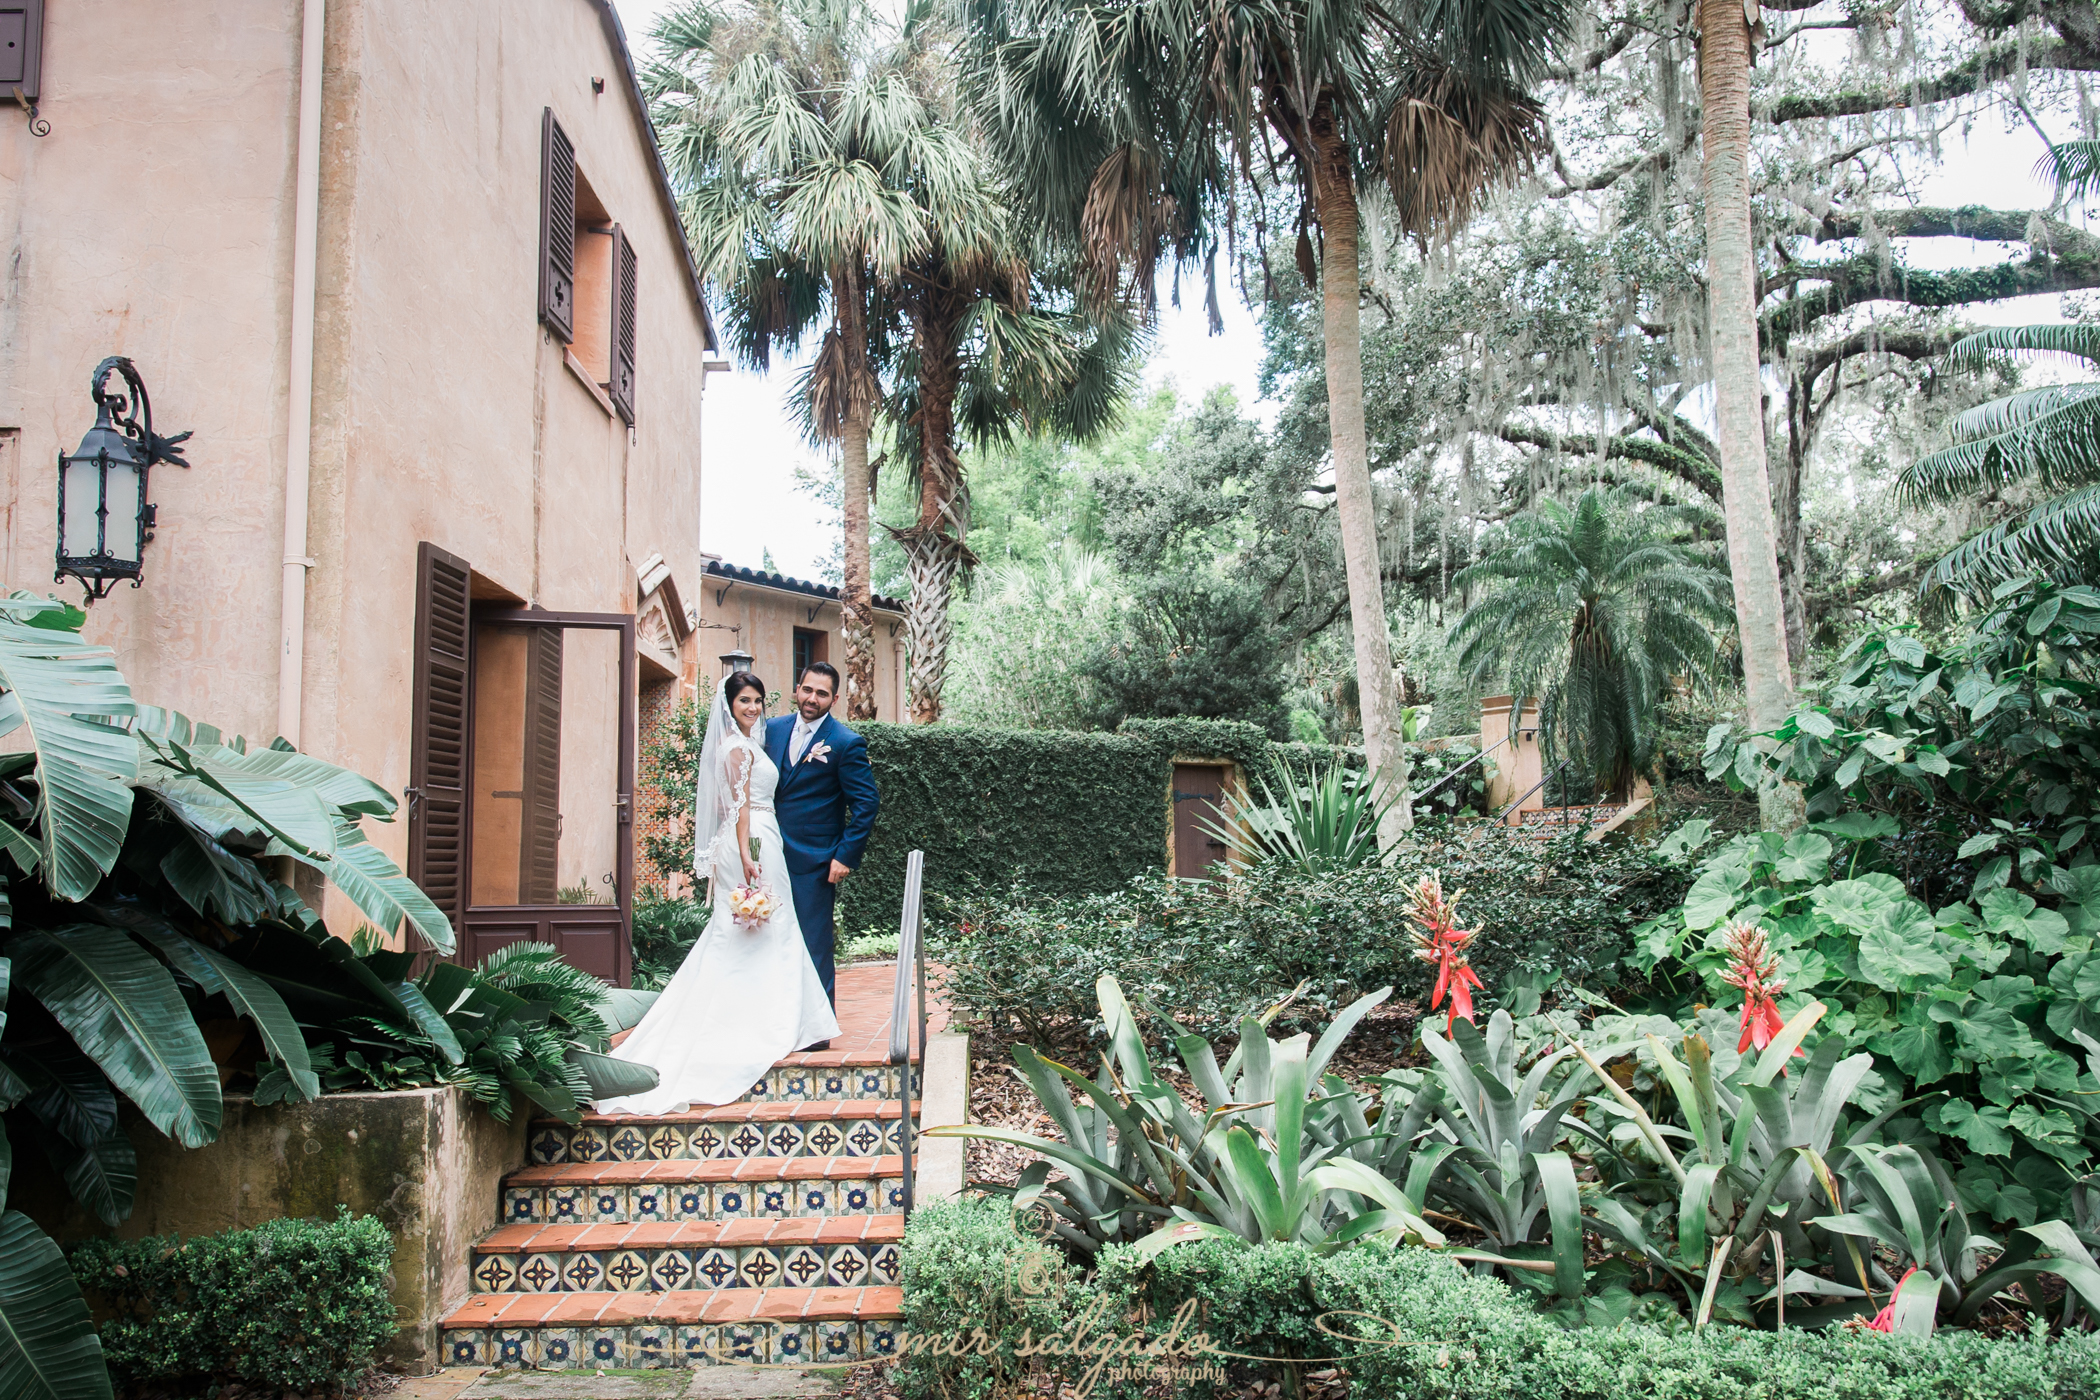 Bok-tower-gardens-wedding-photo, Bok-tower-gardens-wedding-day, garden-wedding-photo